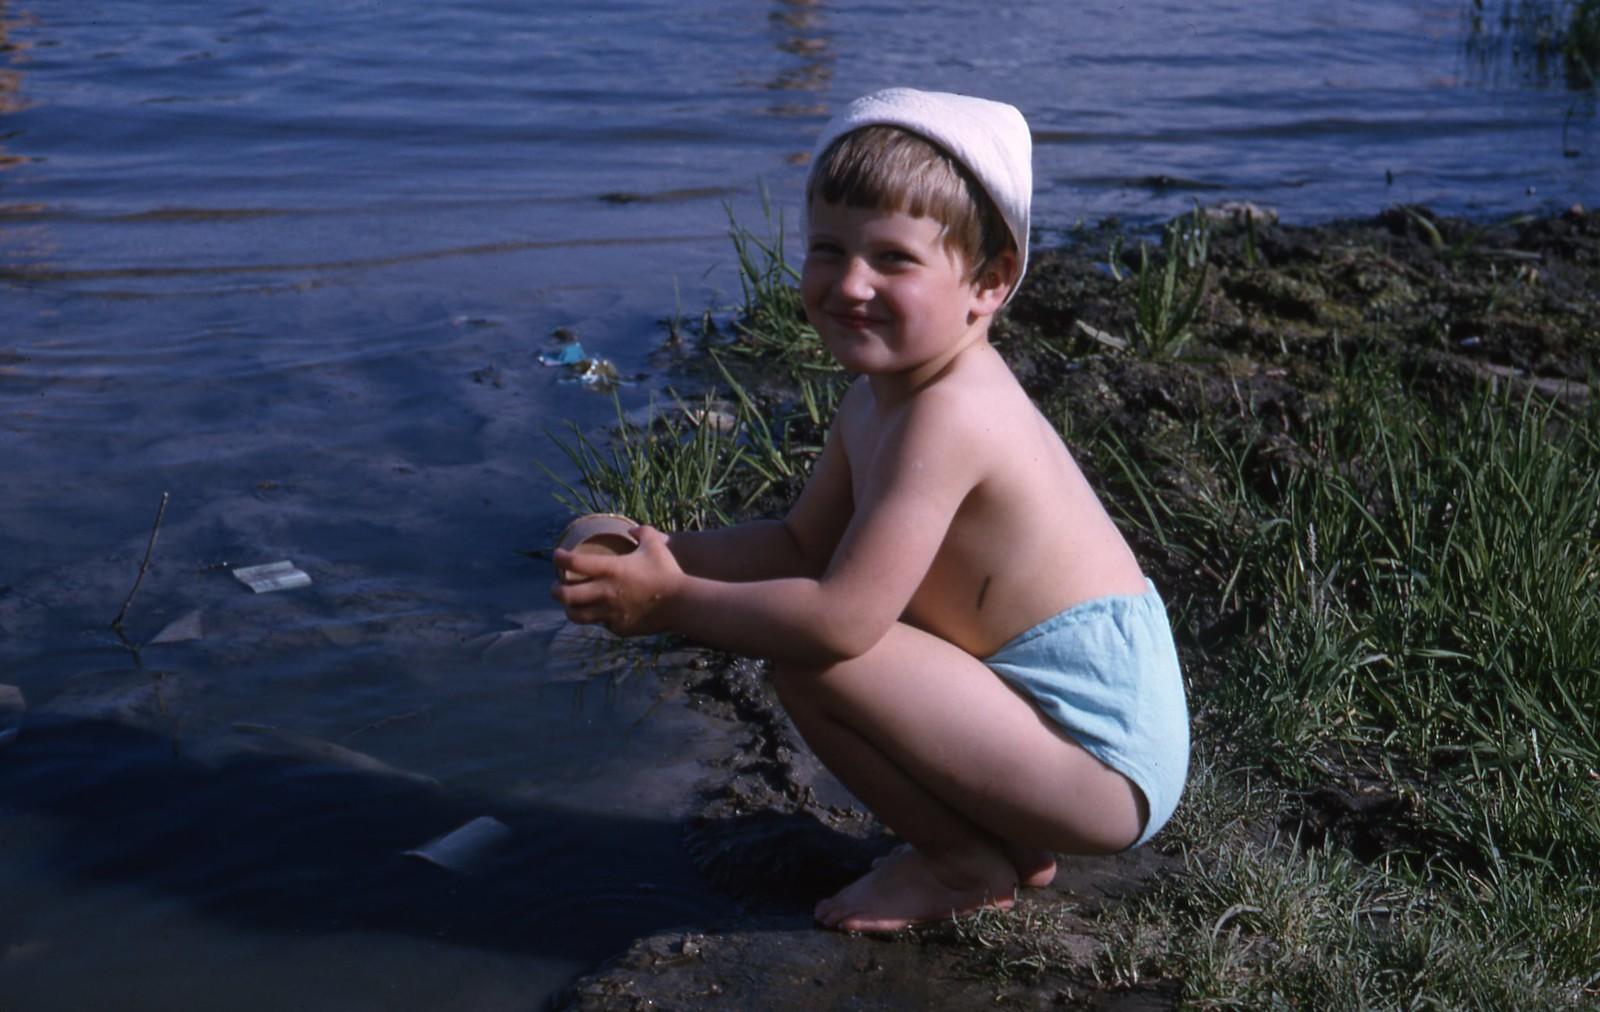 hammond-MA10-Ostankino-people-sunbathing-and-fishing-024